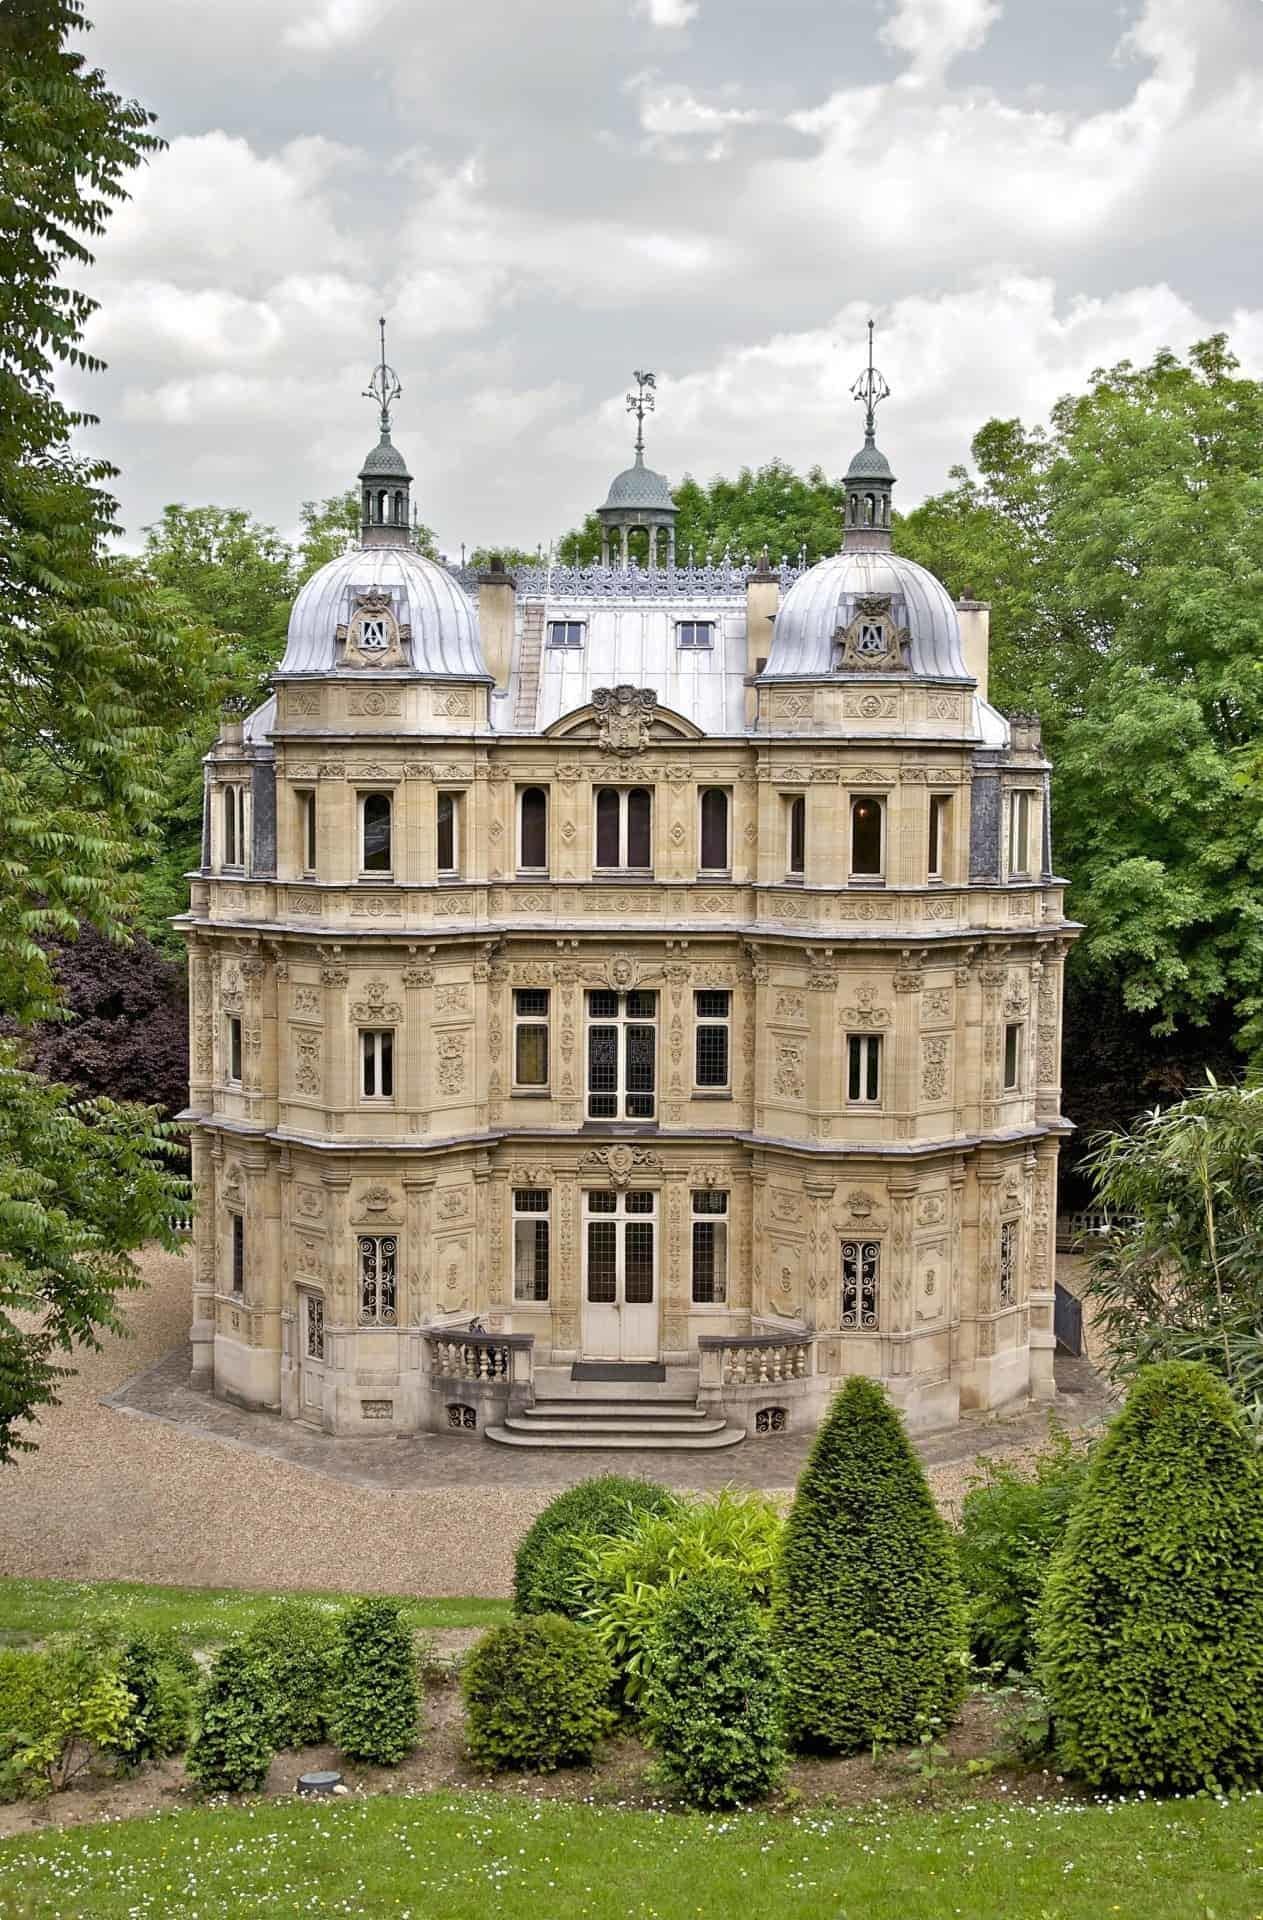 Alexander Dumas' residence, Chateau du Monte-Cristo